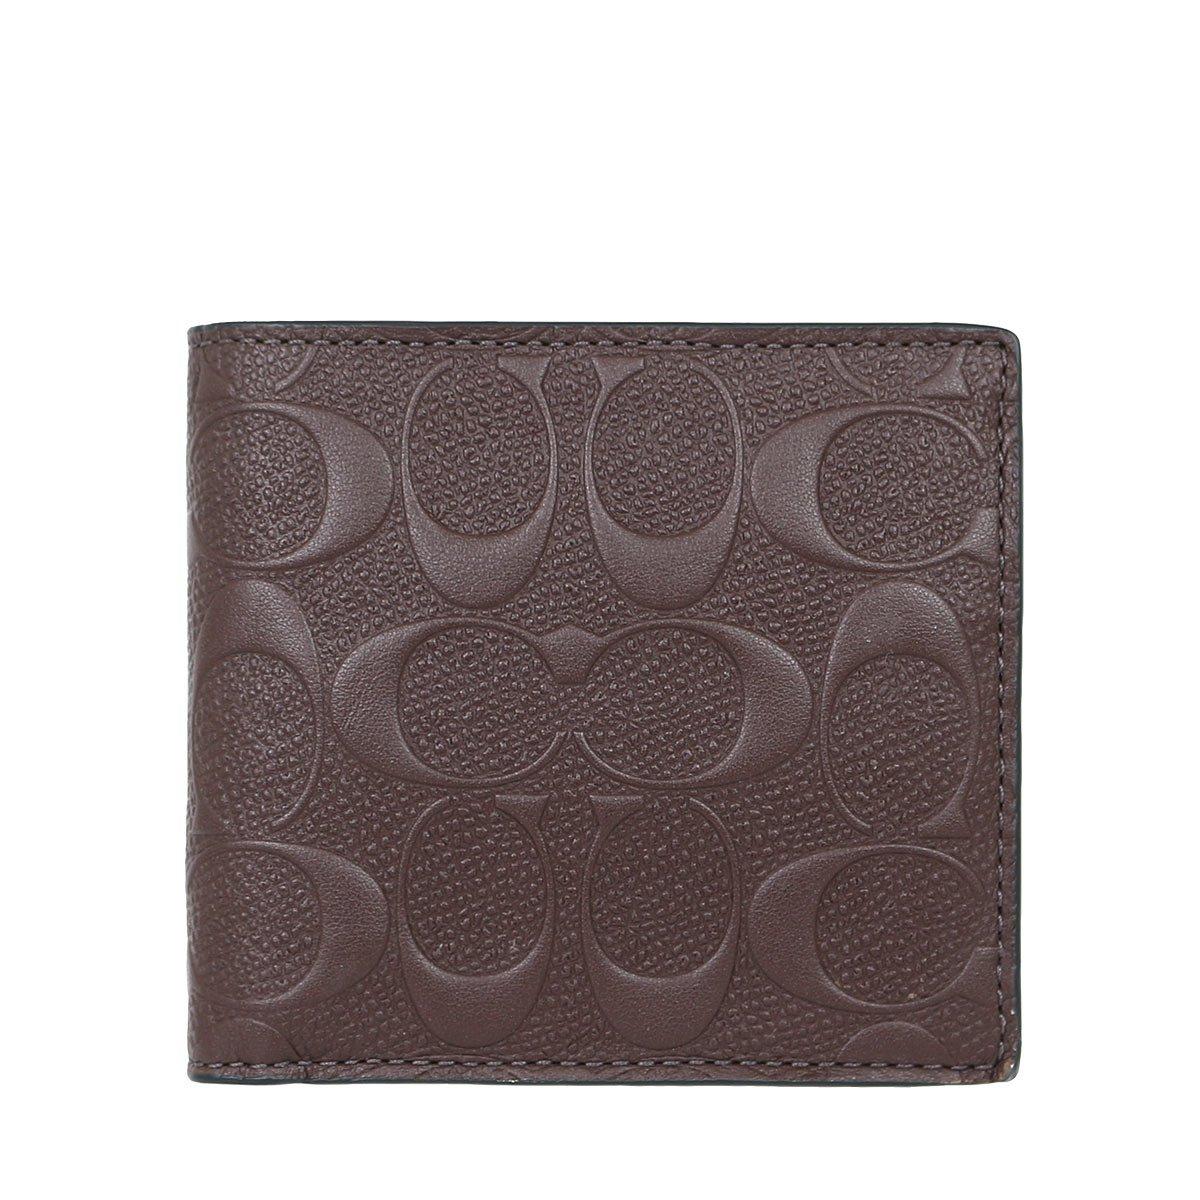 COACH(コーチ) 財布 F75363 シグネチャー [アウトレット品] [並行輸入品]